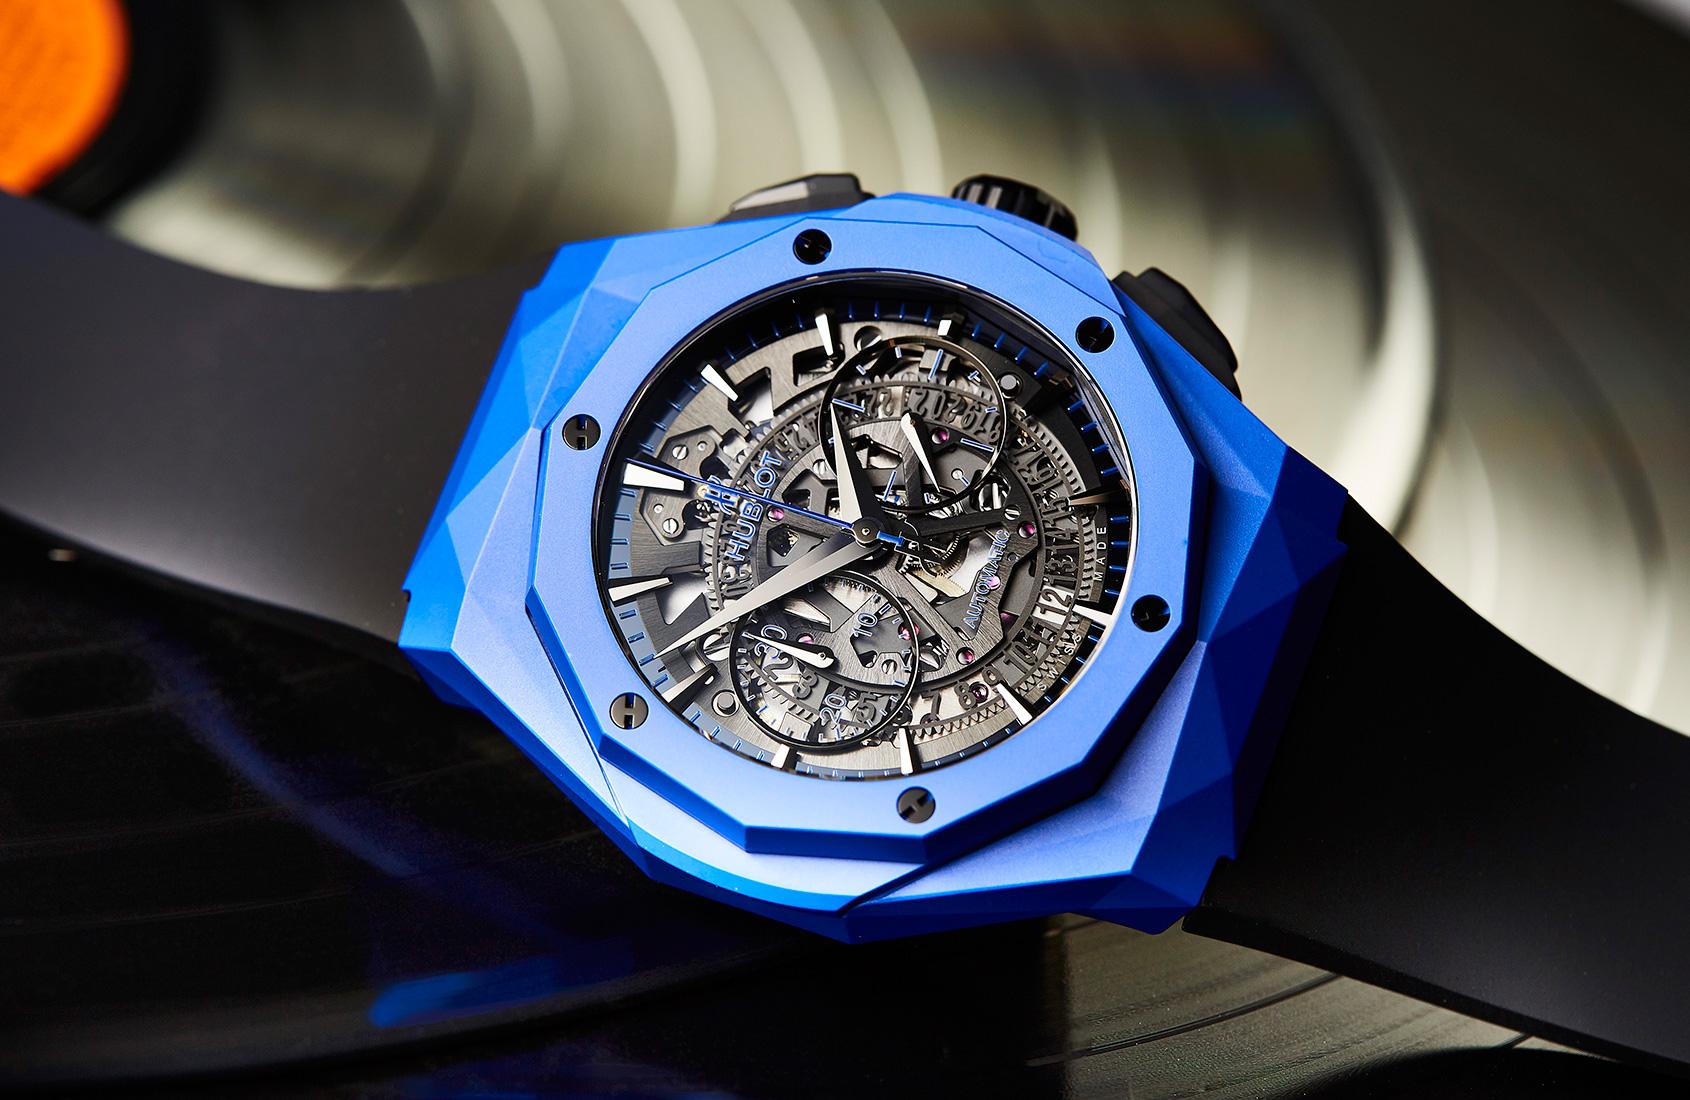 Blue heaven is the Hublot Aerofusion Chronograph Orlinski Blue Ceramic